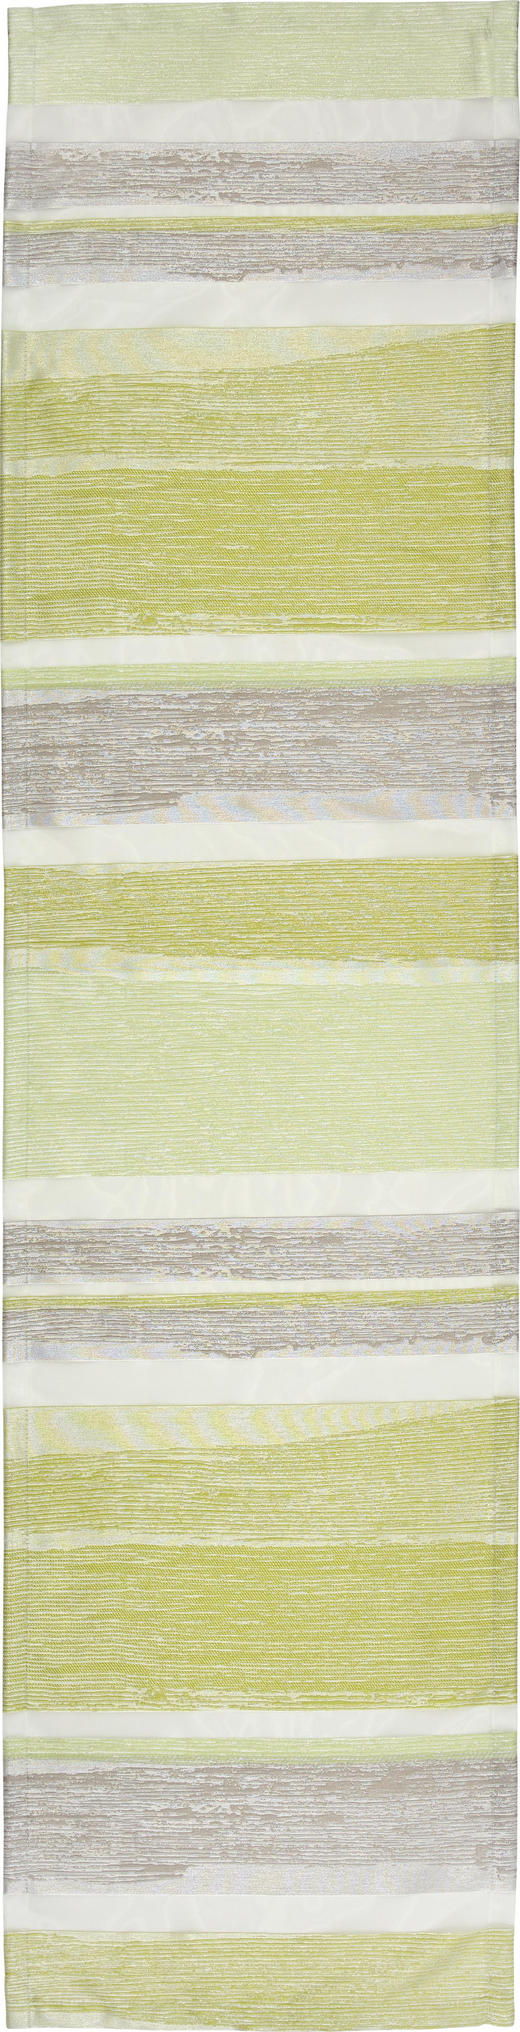 TISCHLÄUFER 45/165 cm - Grün, Design, Textil (45/165cm) - Novel